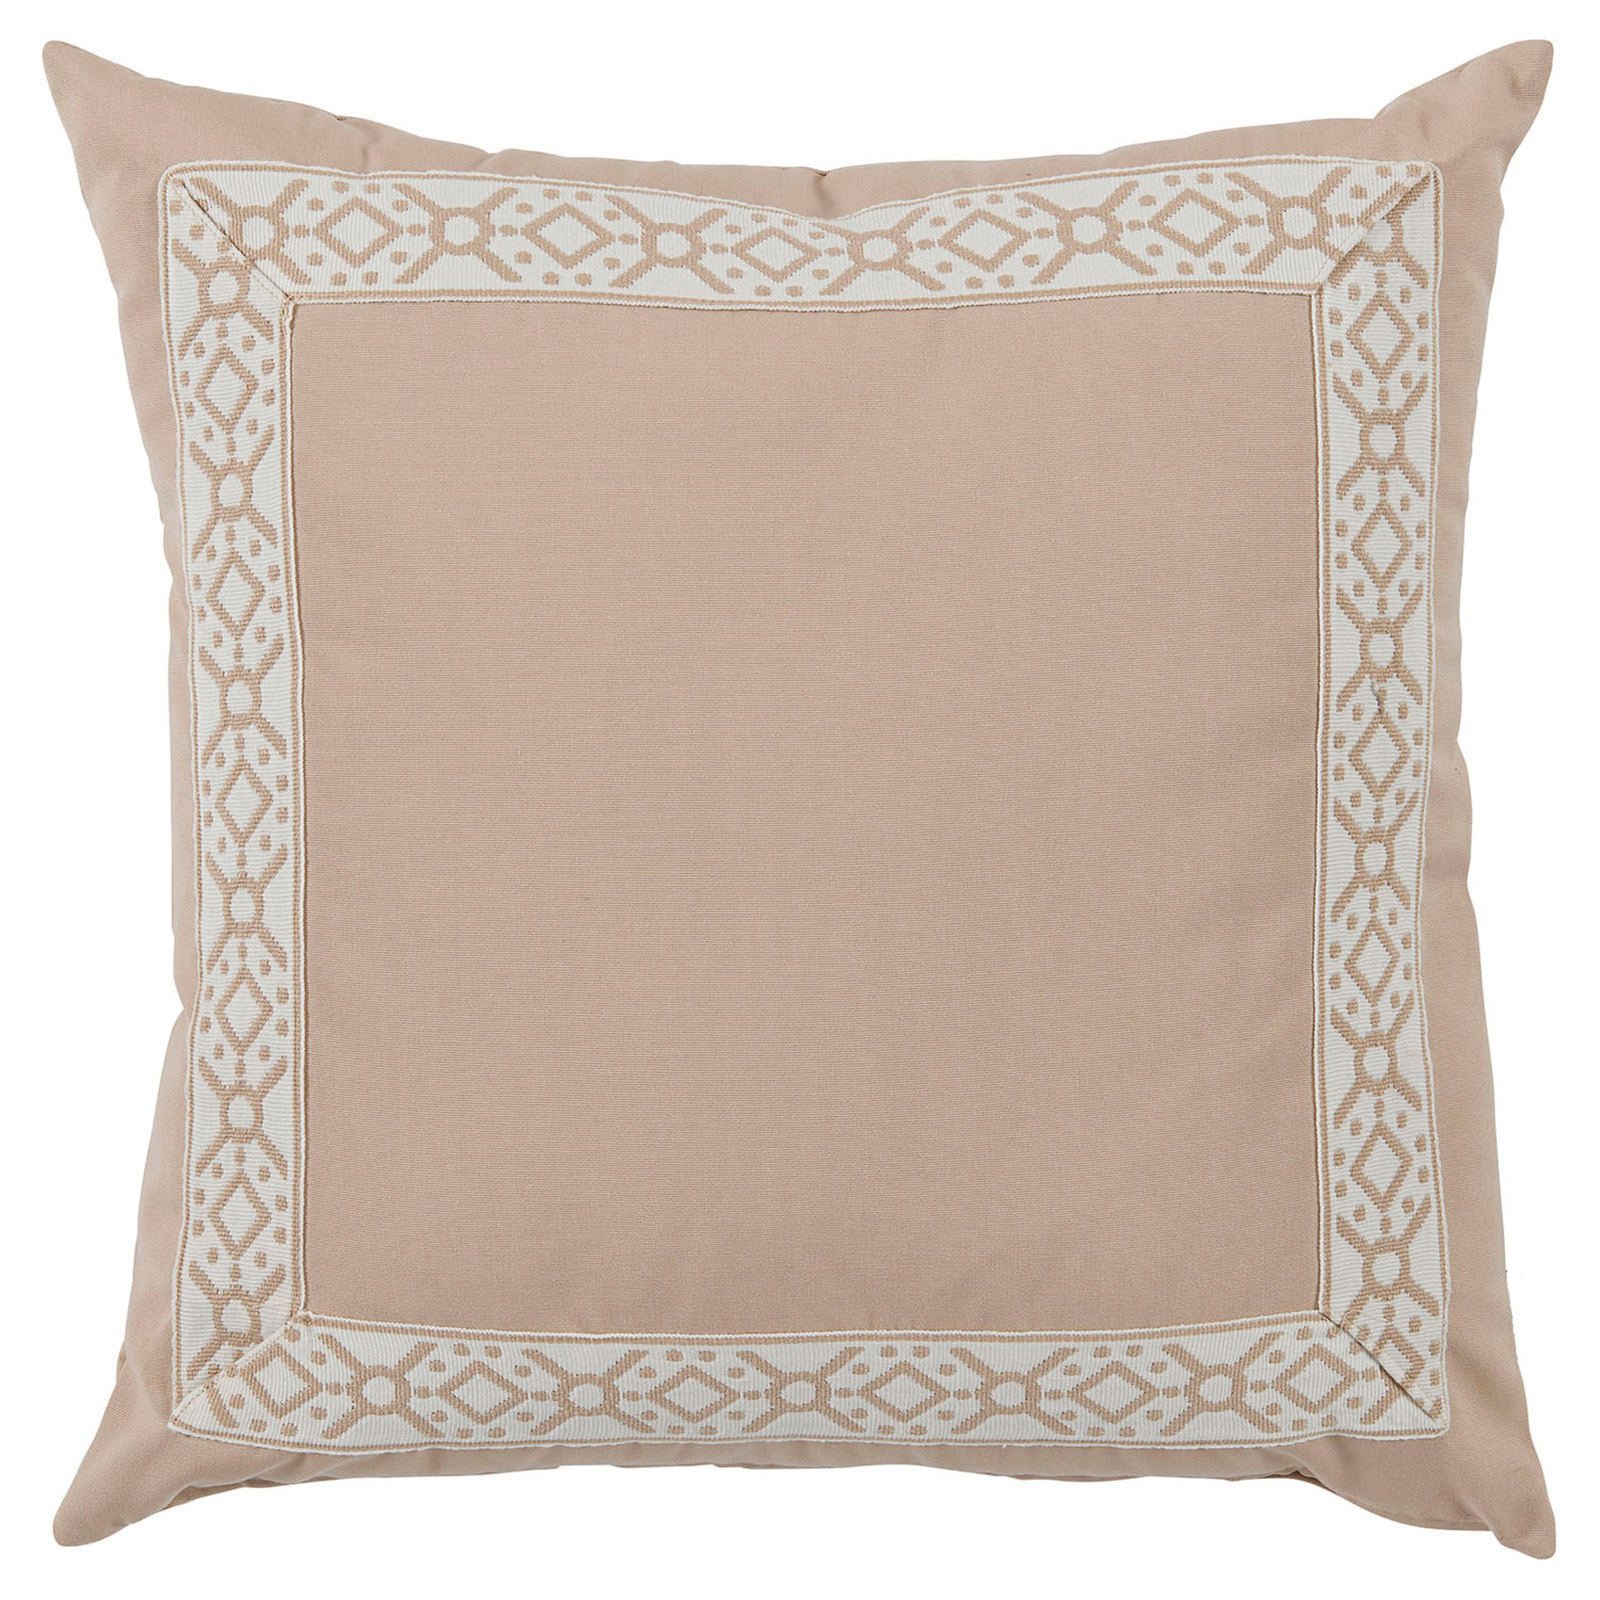 Perri Modern Global Ivory Trim Beige Outdoor Pillow - 22x22